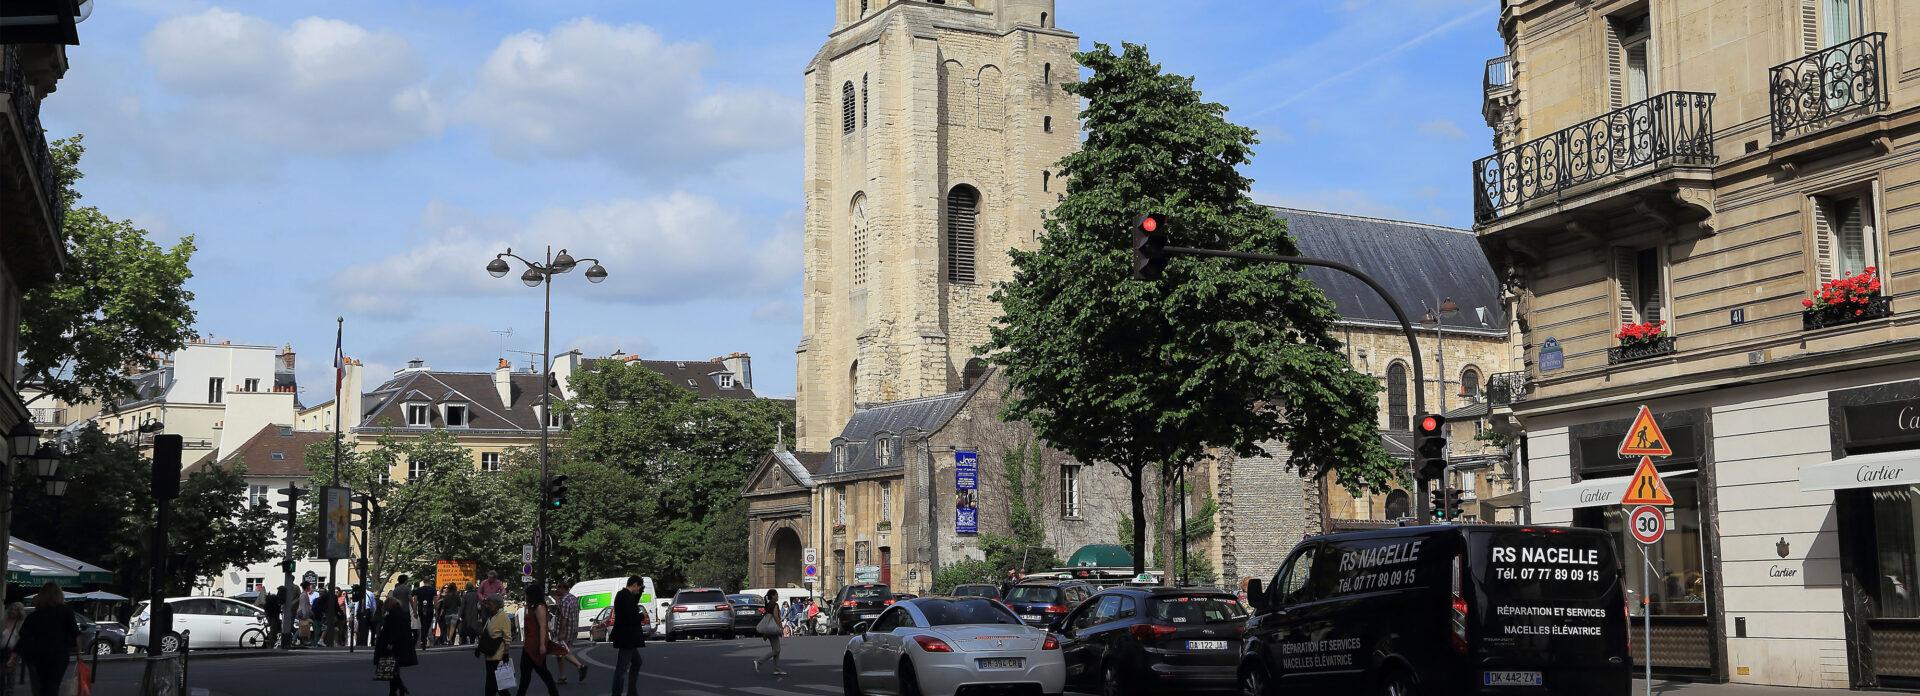 Saint Germain des Pres Paris kirke Frankrike